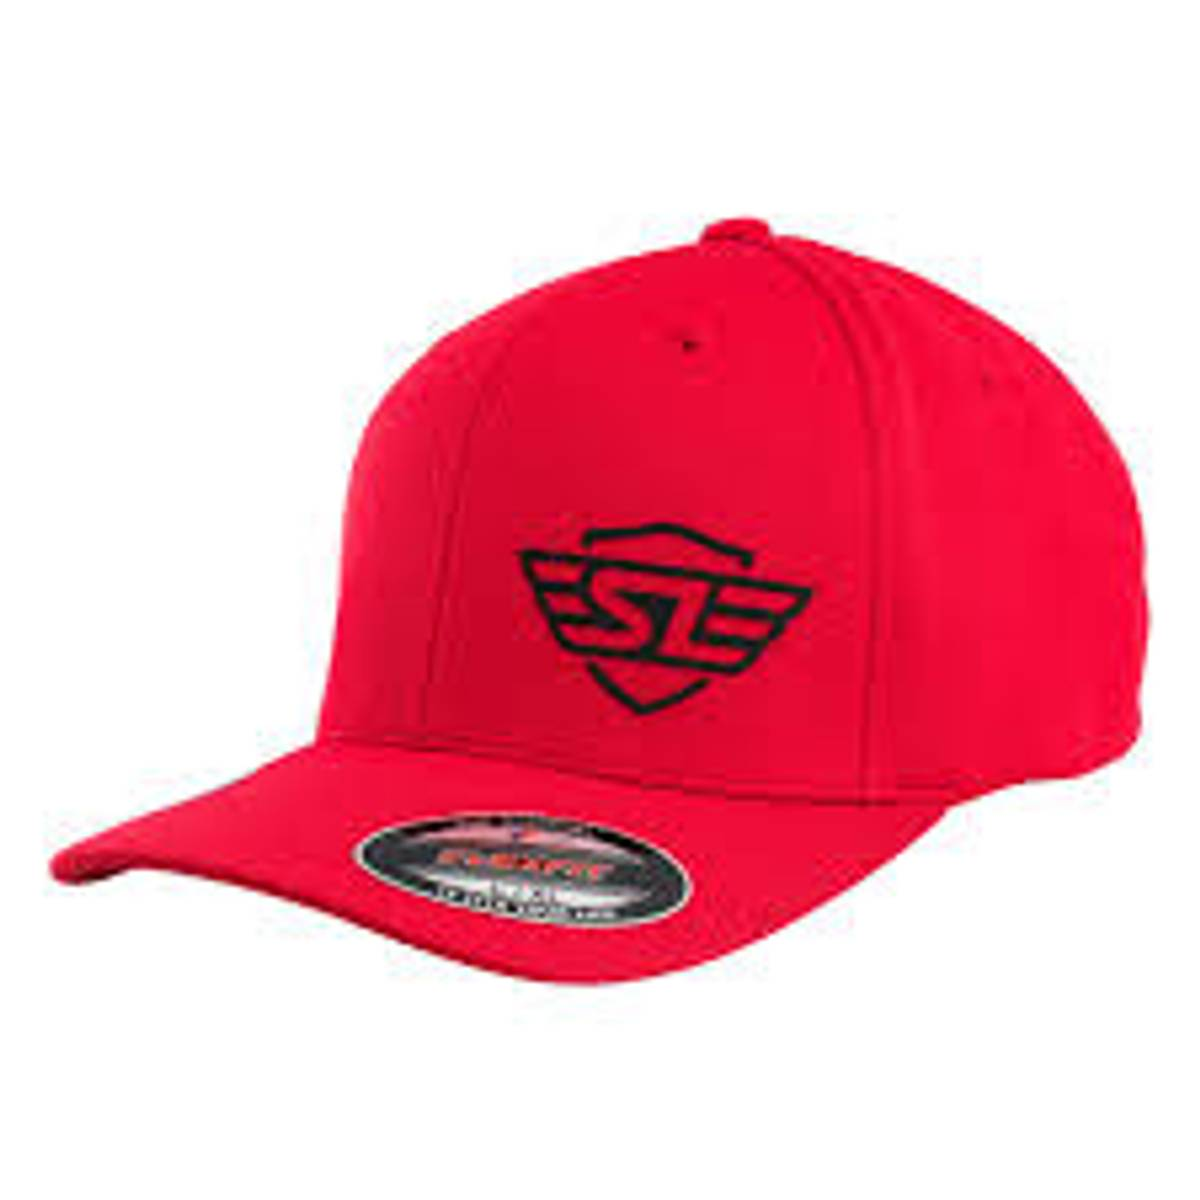 Discmania Simon flexfit hat